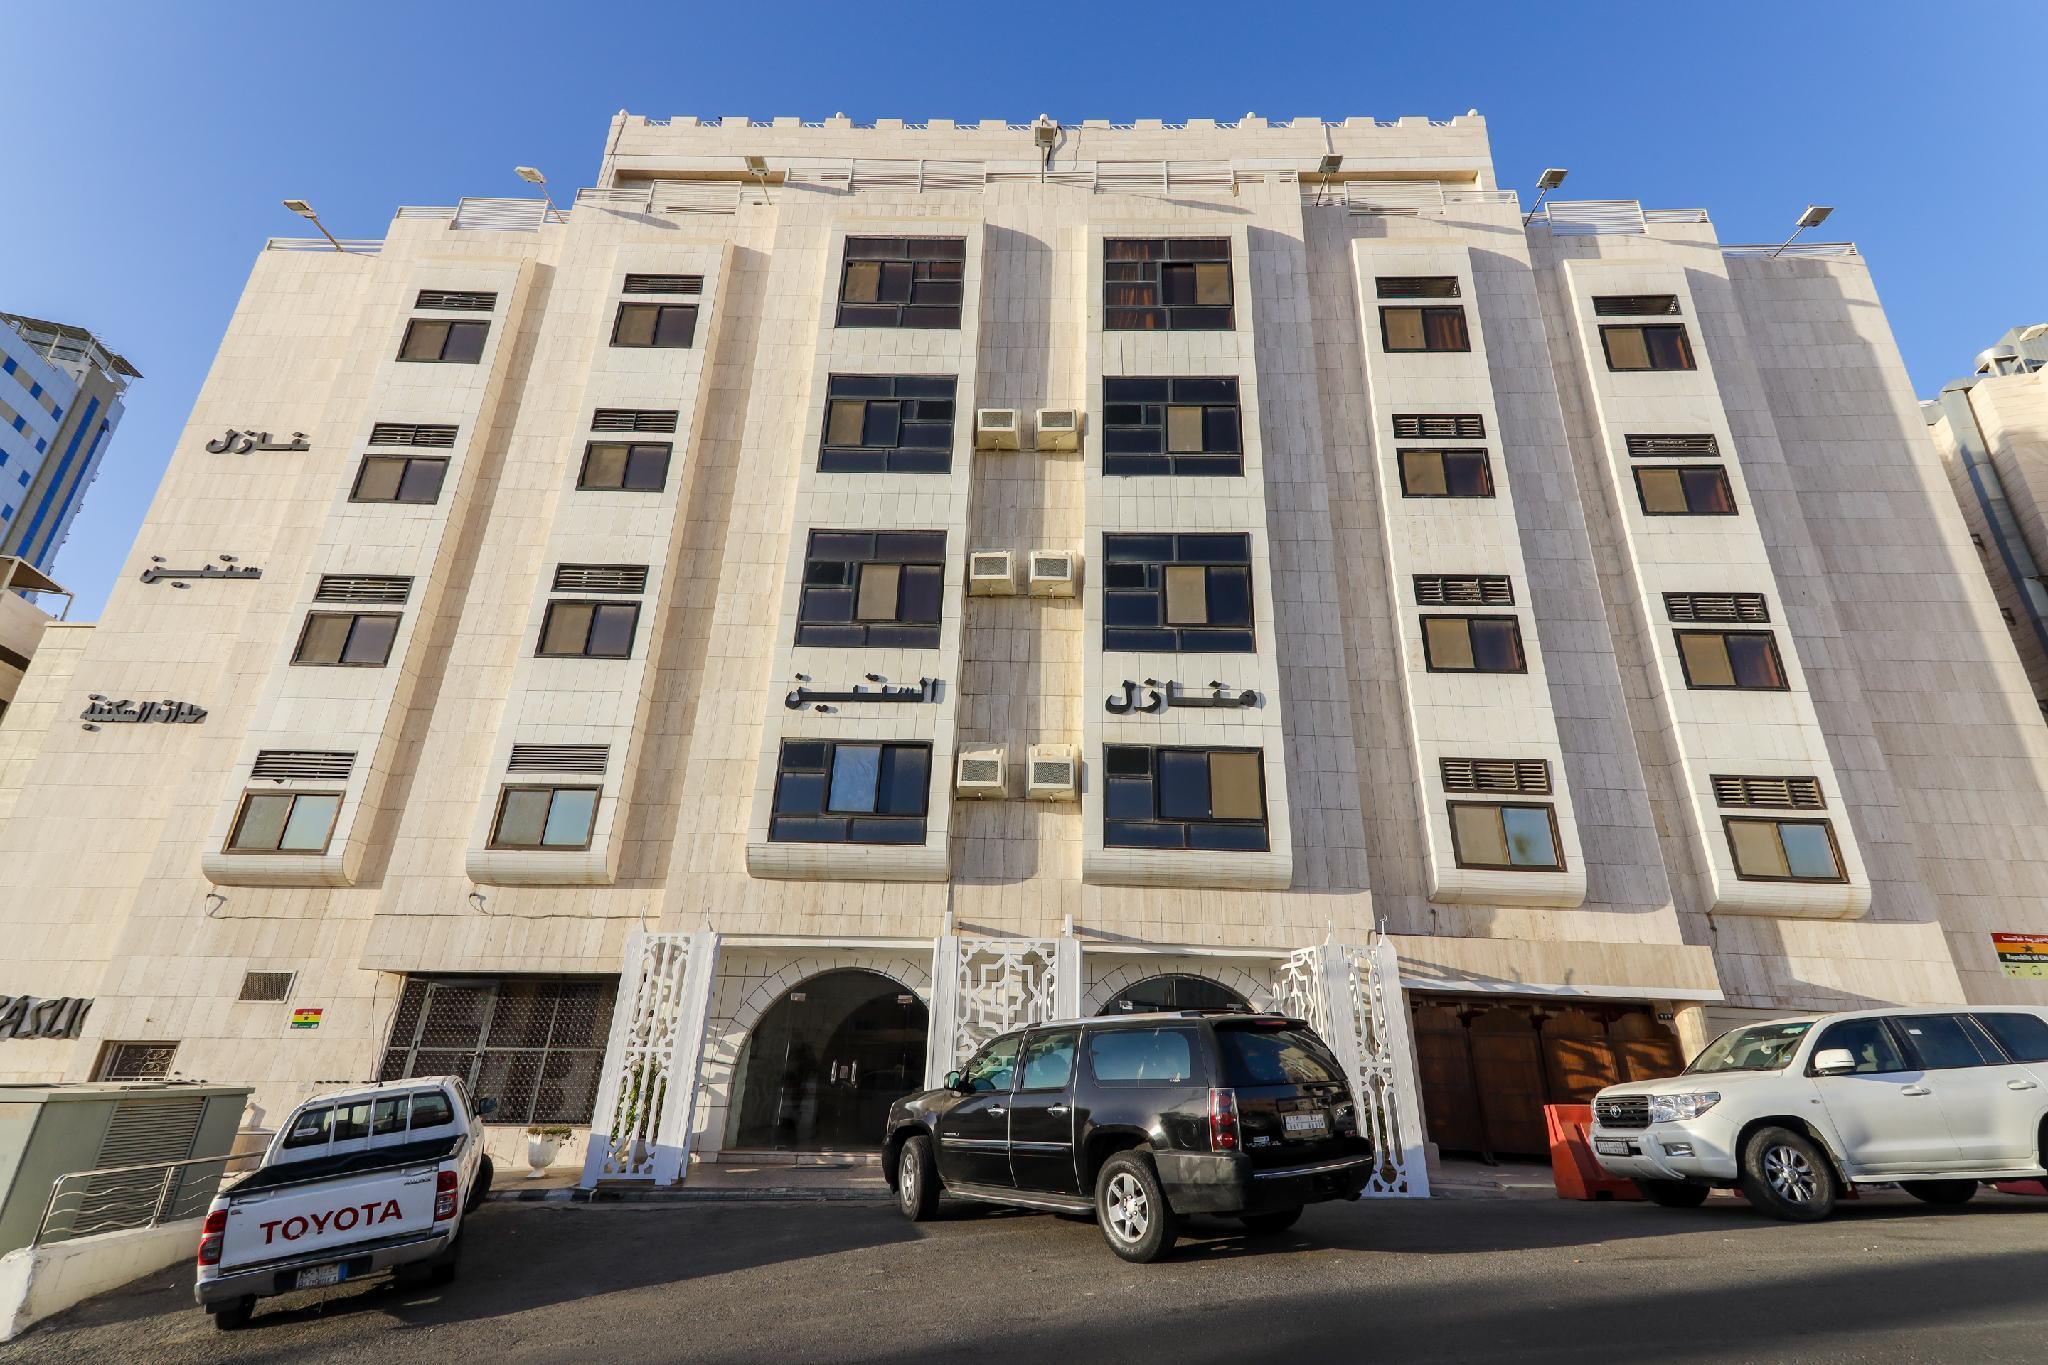 OYO 168 Manazl Al Steen Housing Units